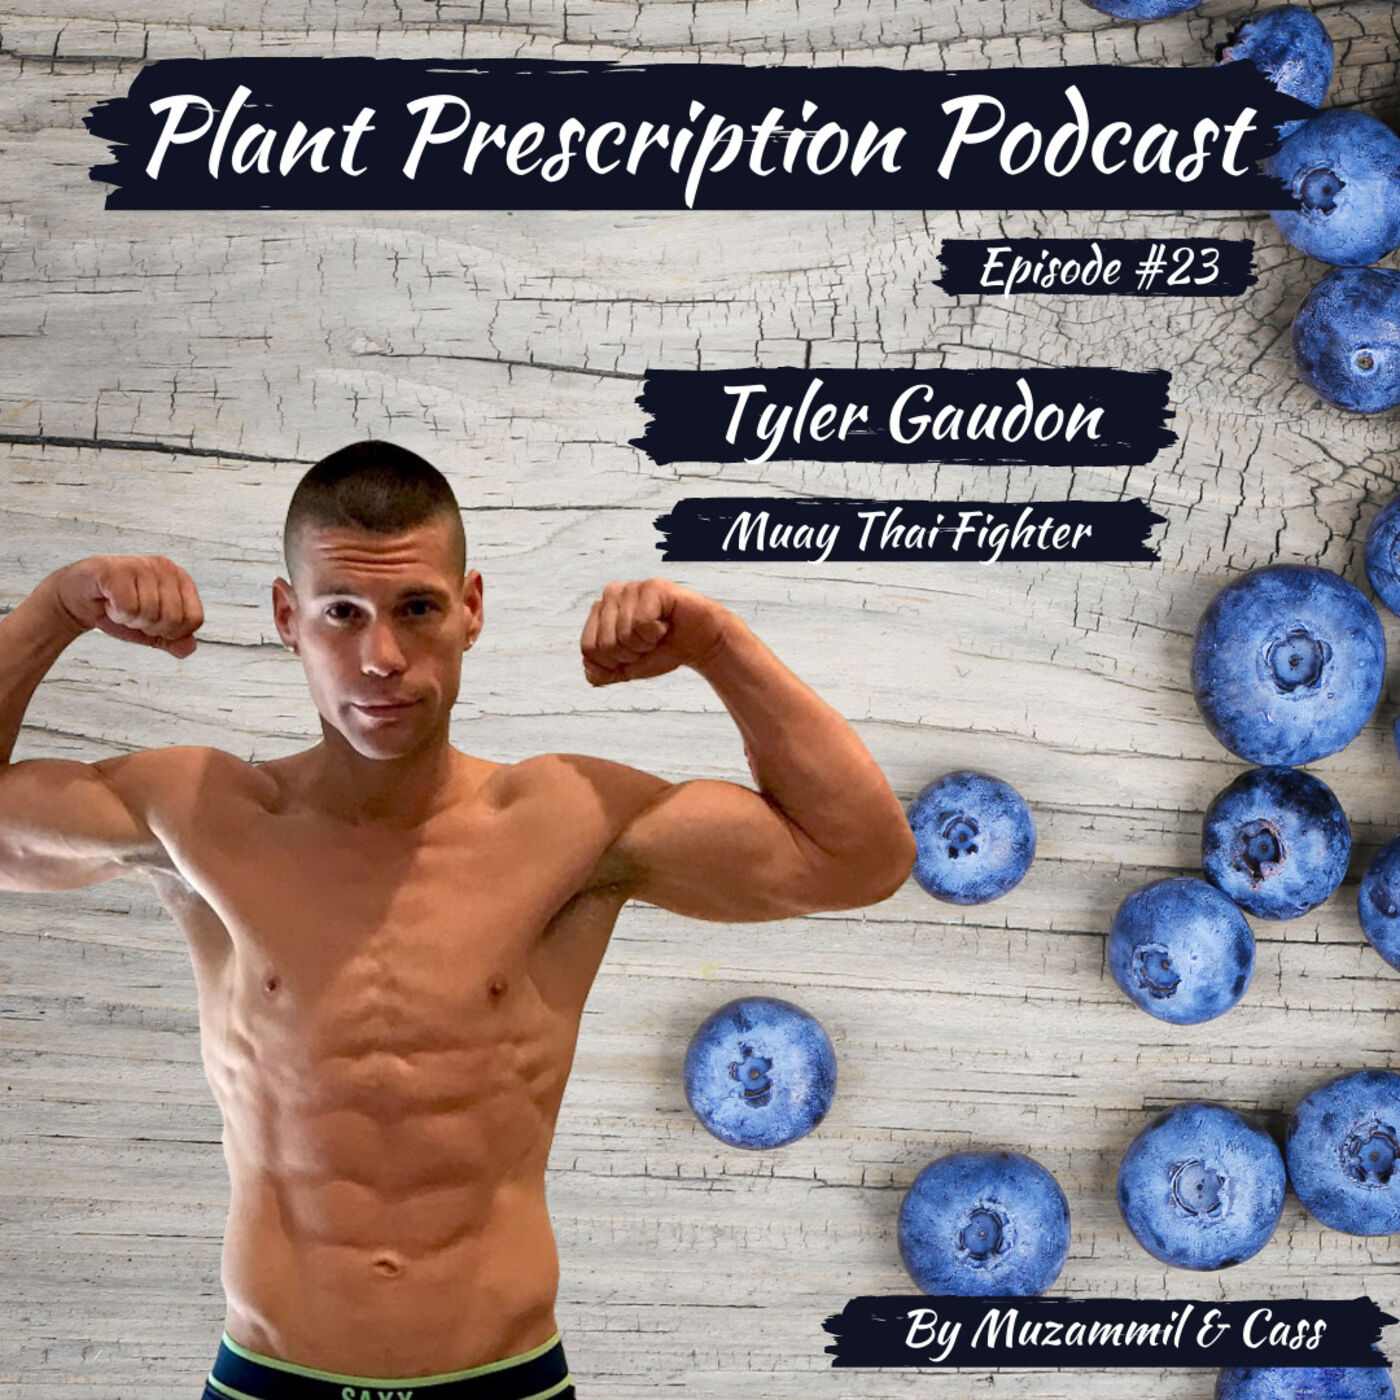 From drug addict to vegan Muay Thai fighter: Tyler Gaudon